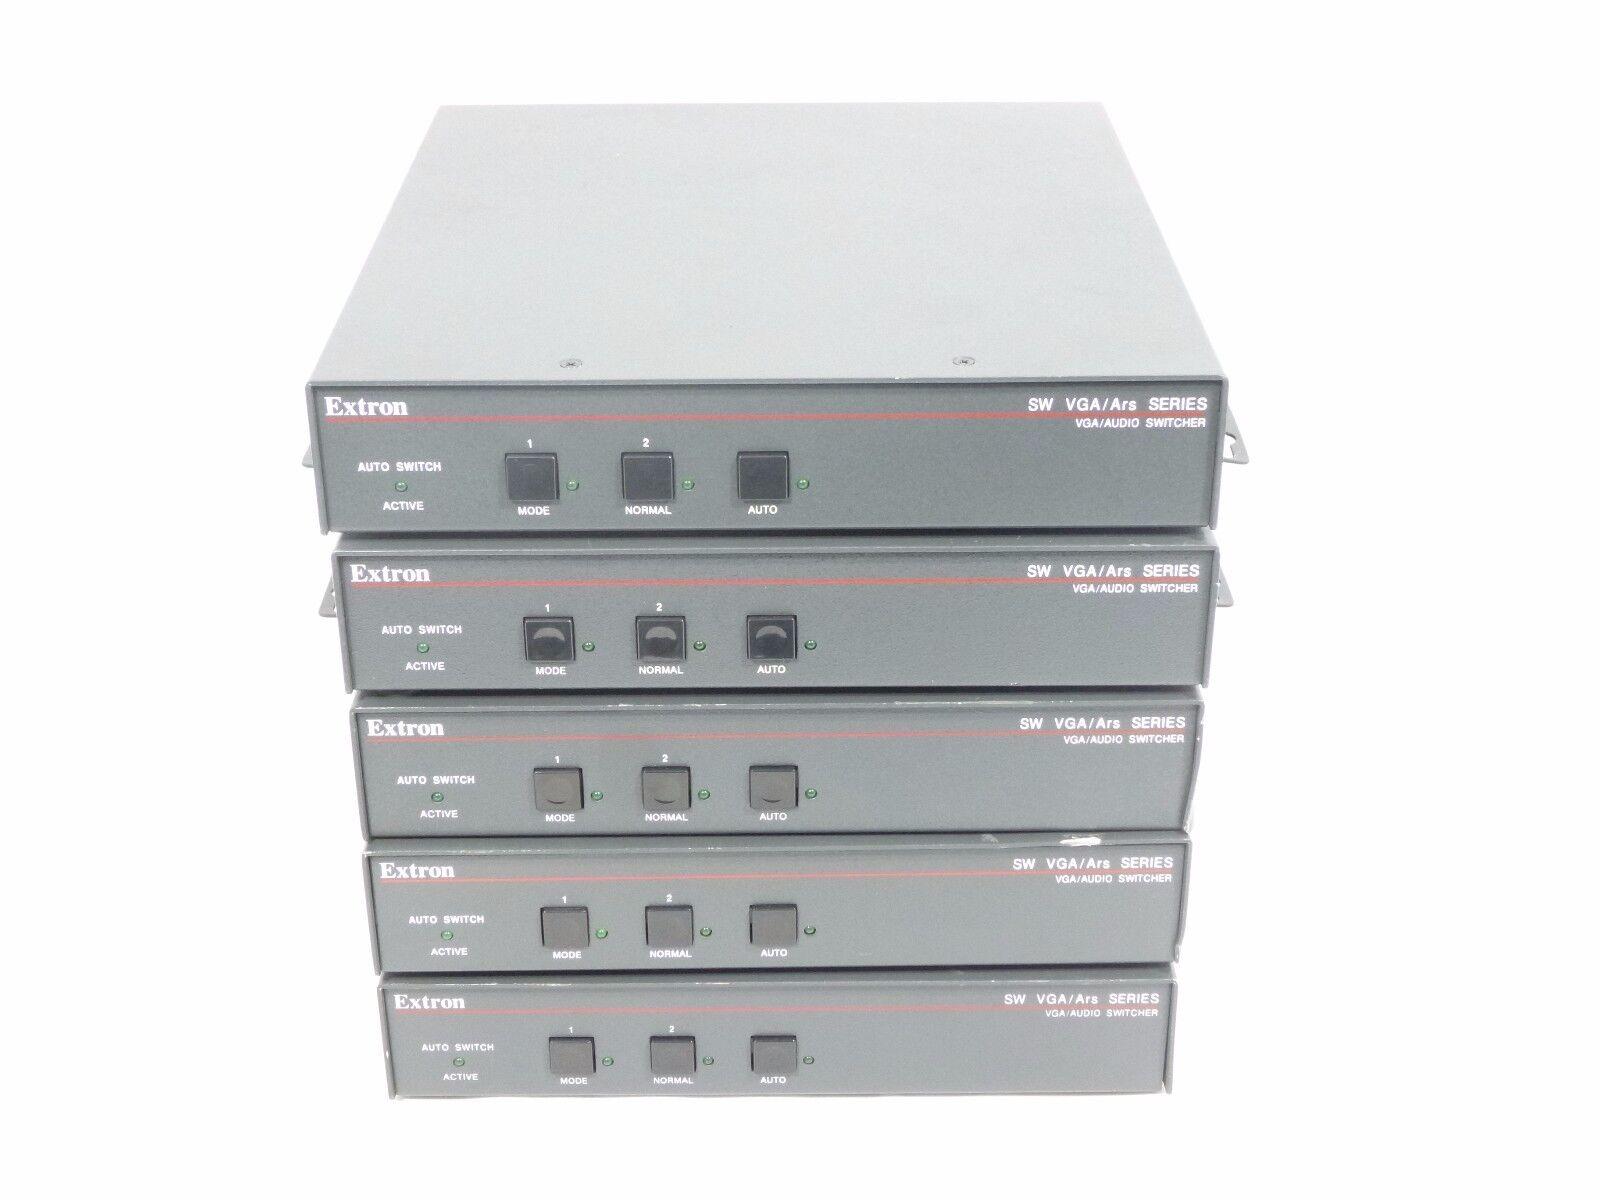 LOT OF 5 EXTRON SW VGA/Ars Series VHA/Audio Switcher SW2